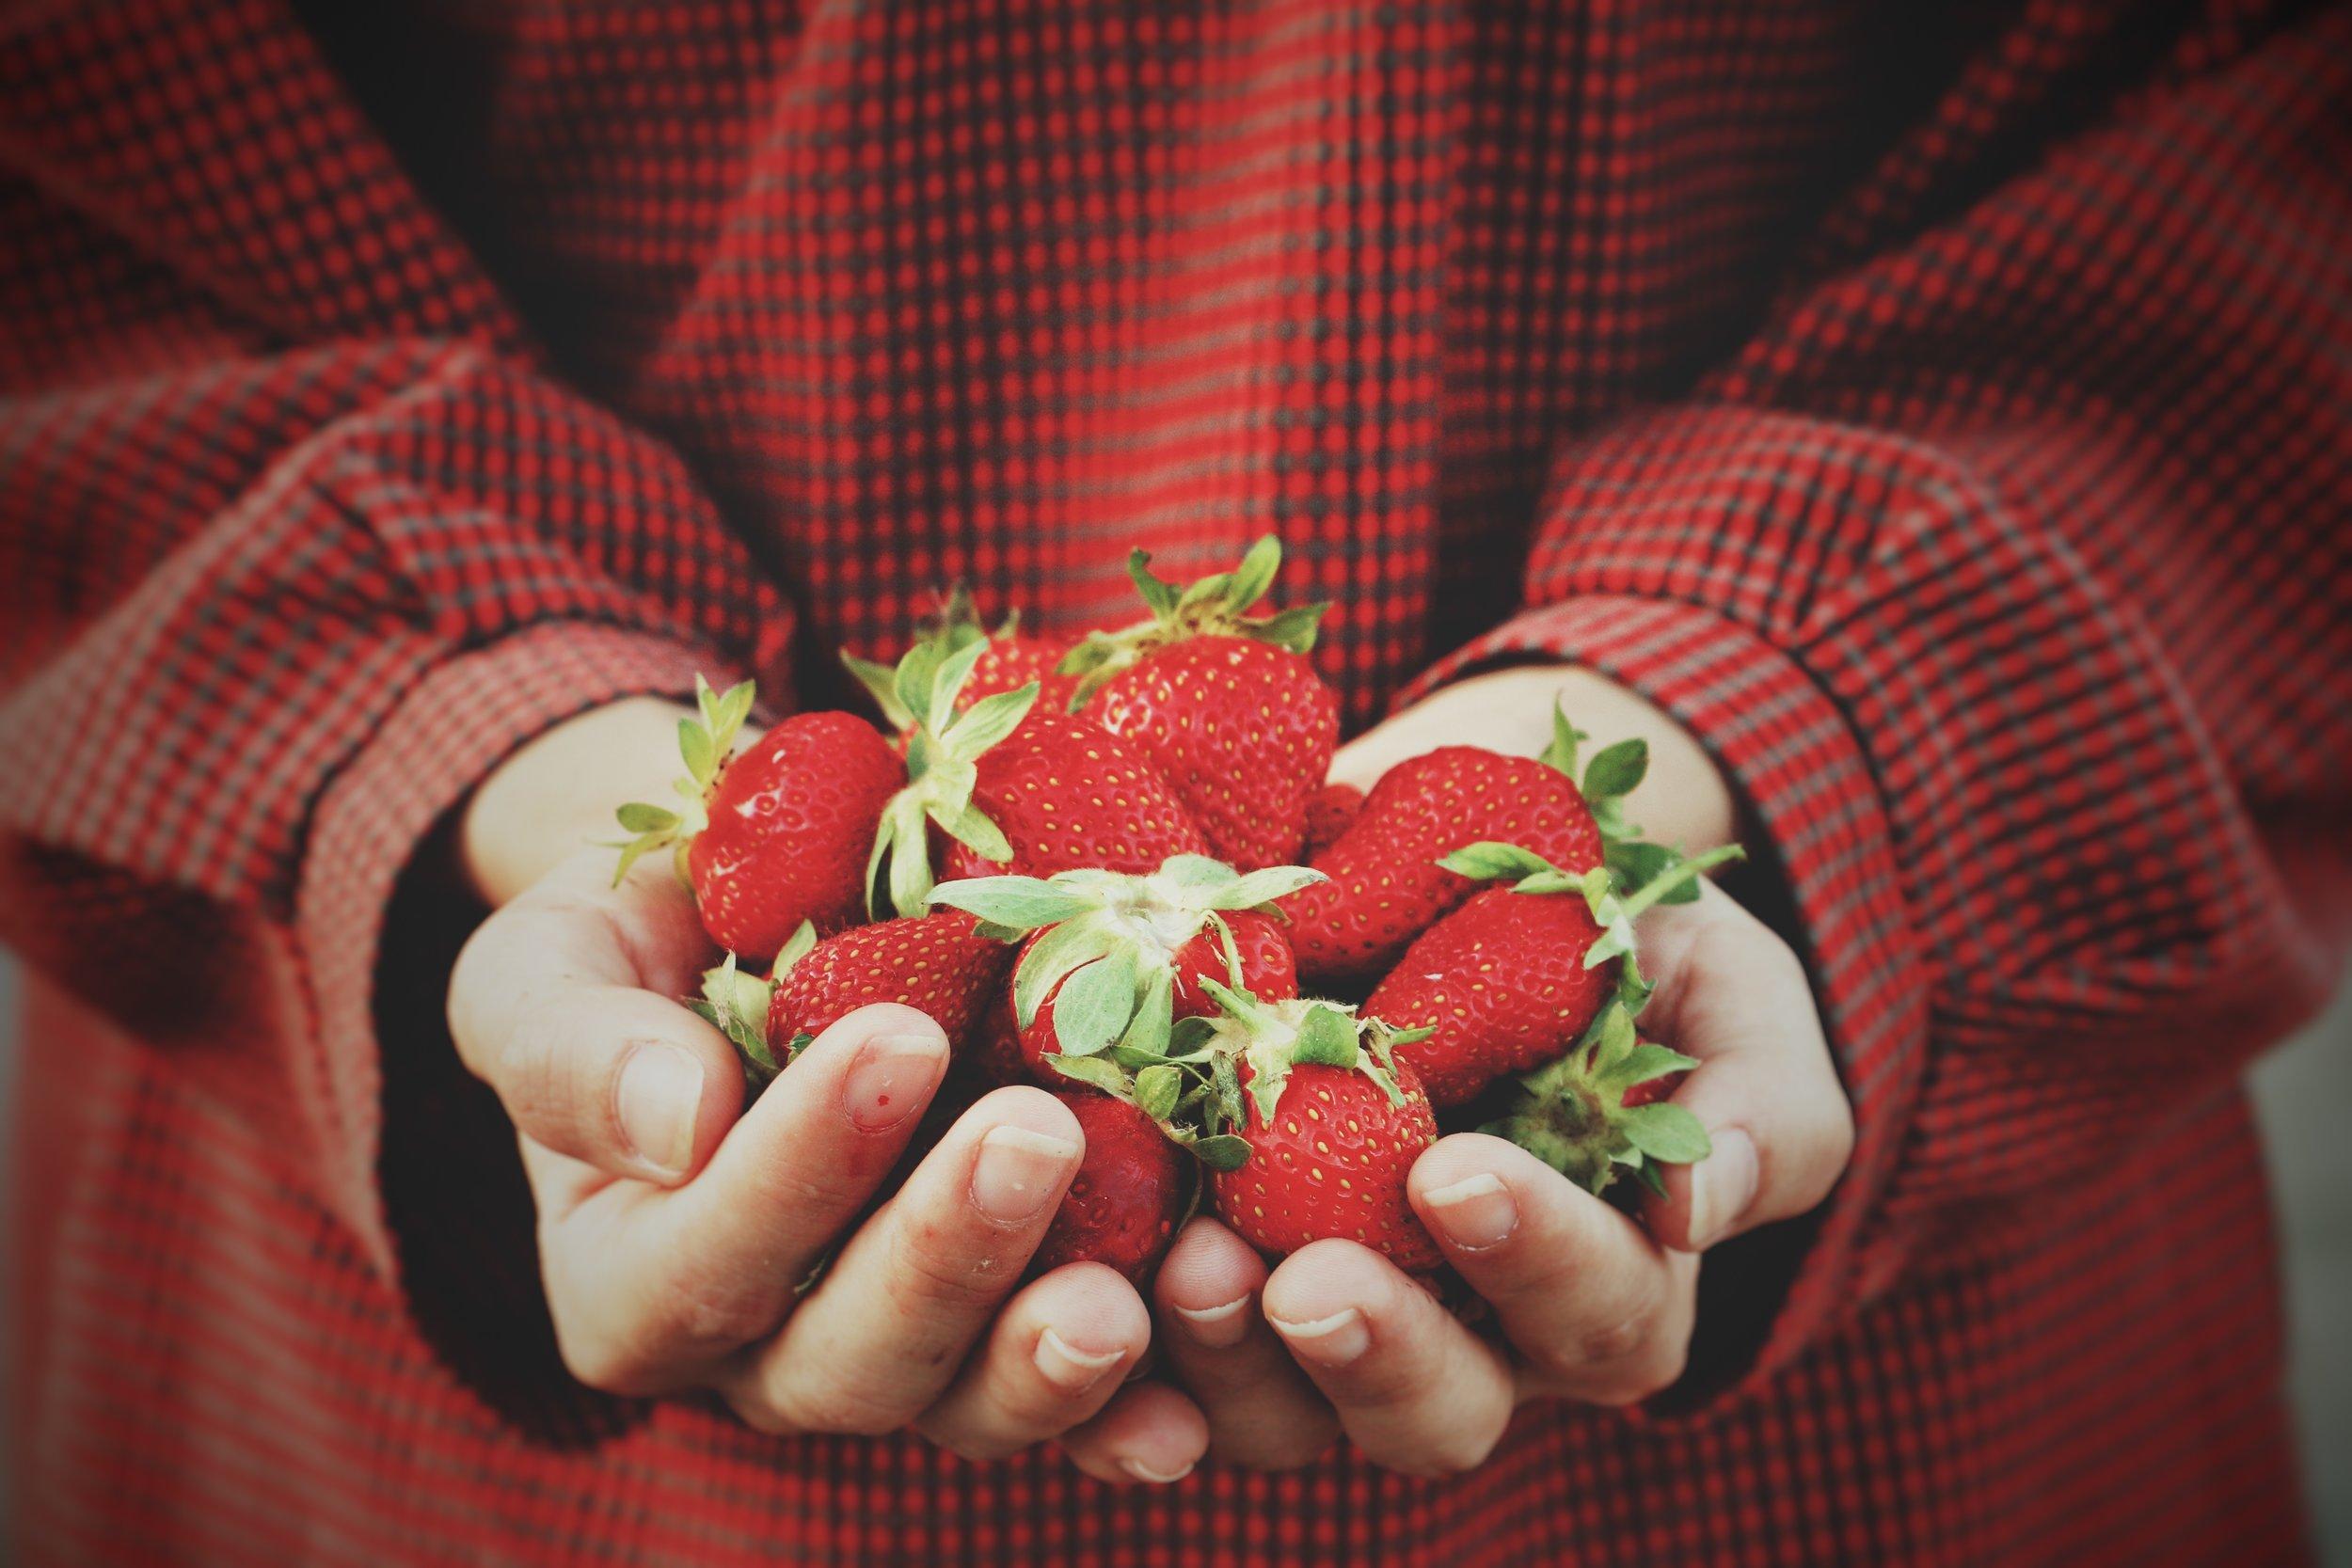 uwm.organic.budget.hand-fruit-finger-food-red-produce-1411932-pxhere.com